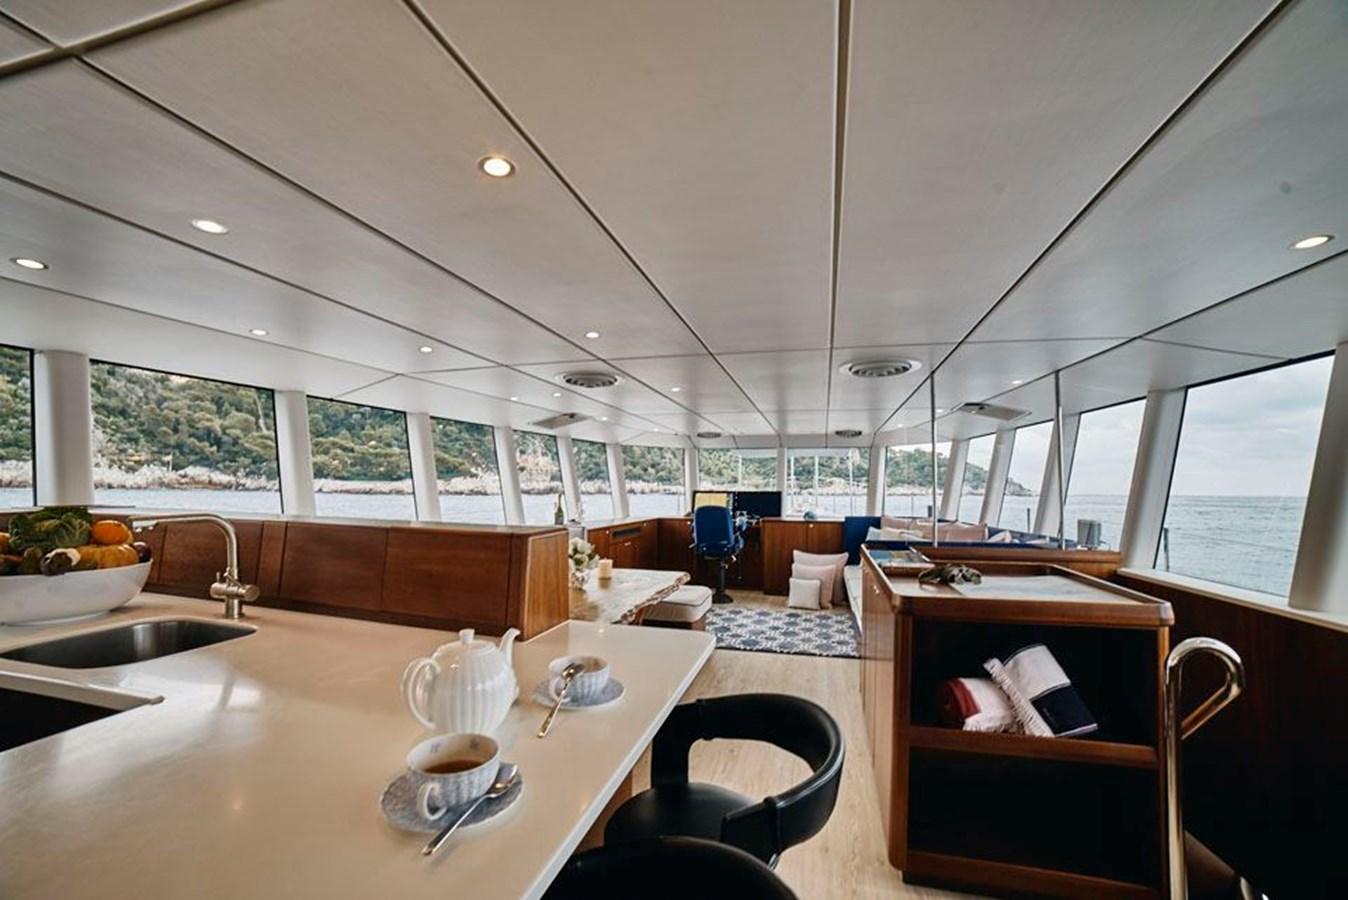 fpb-97-2 2014 CIRCA MARINE FPB 97 Motor Yacht 2788361